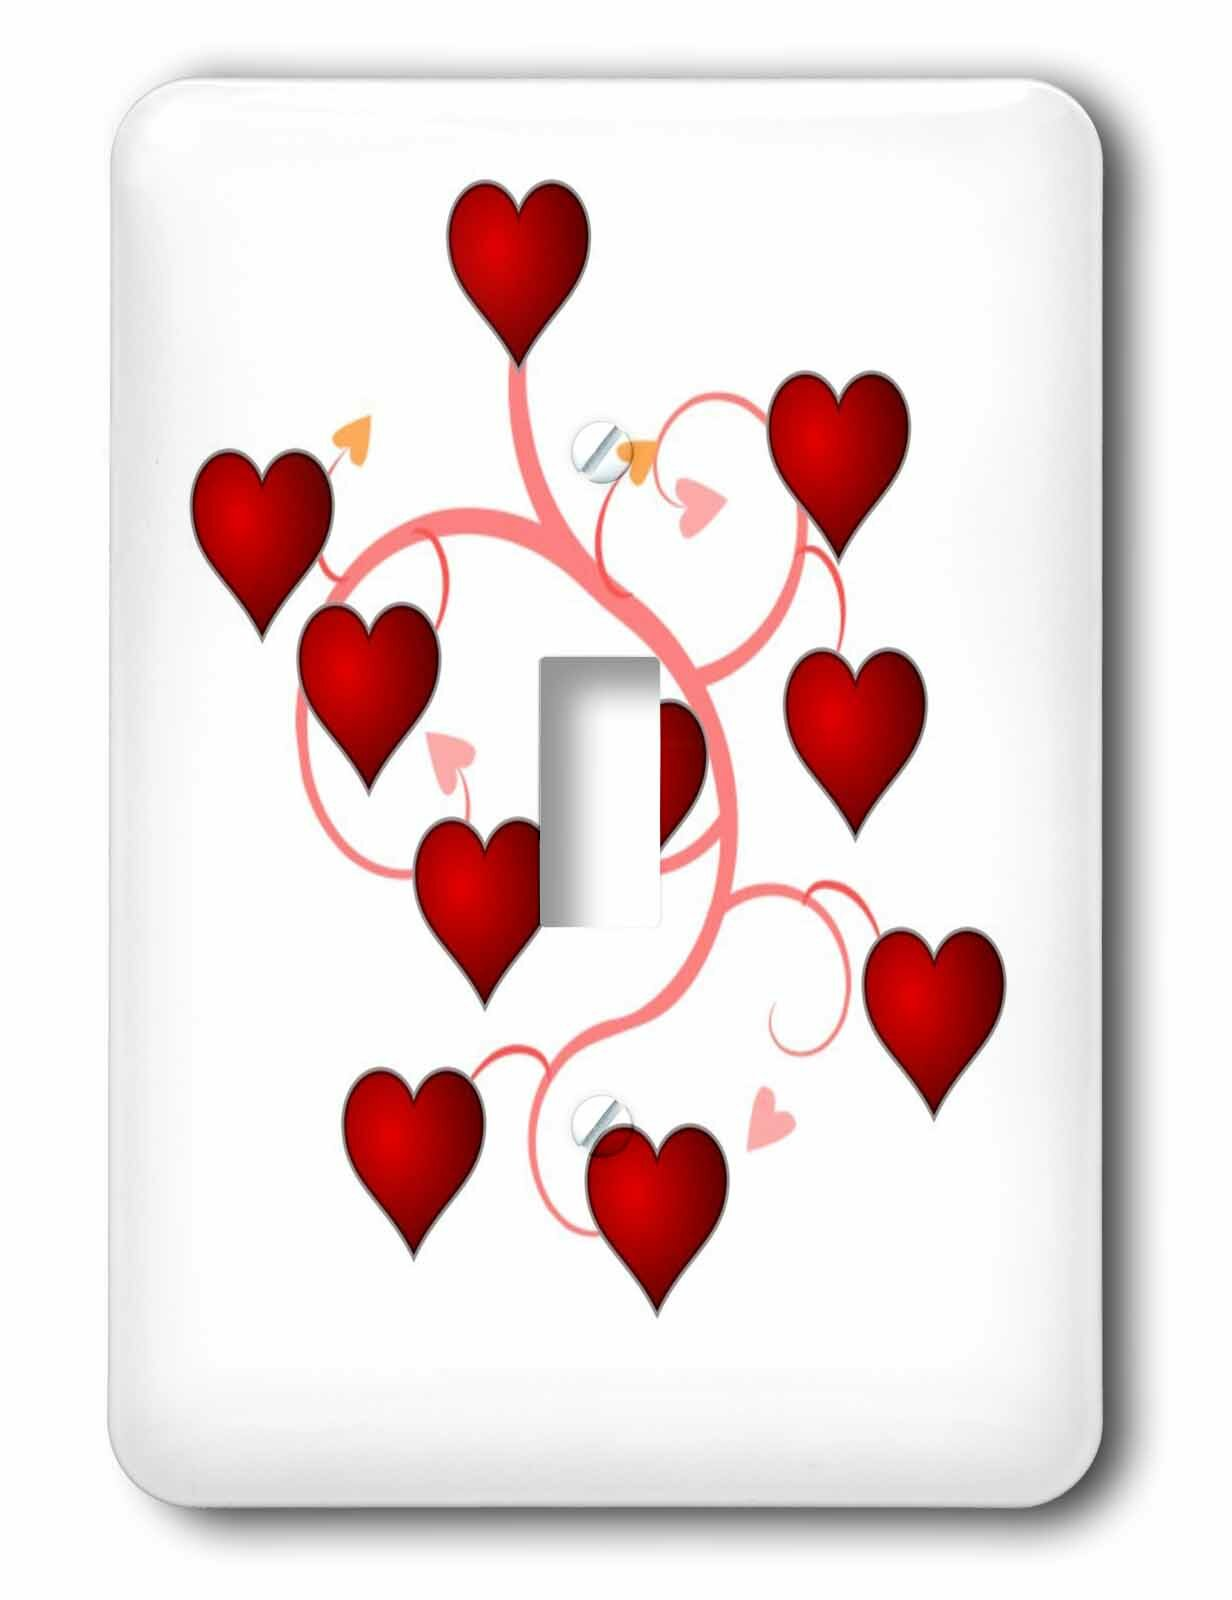 3drose Growing Hearts 1 Gang Toggle Light Switch Wall Plate Wayfair